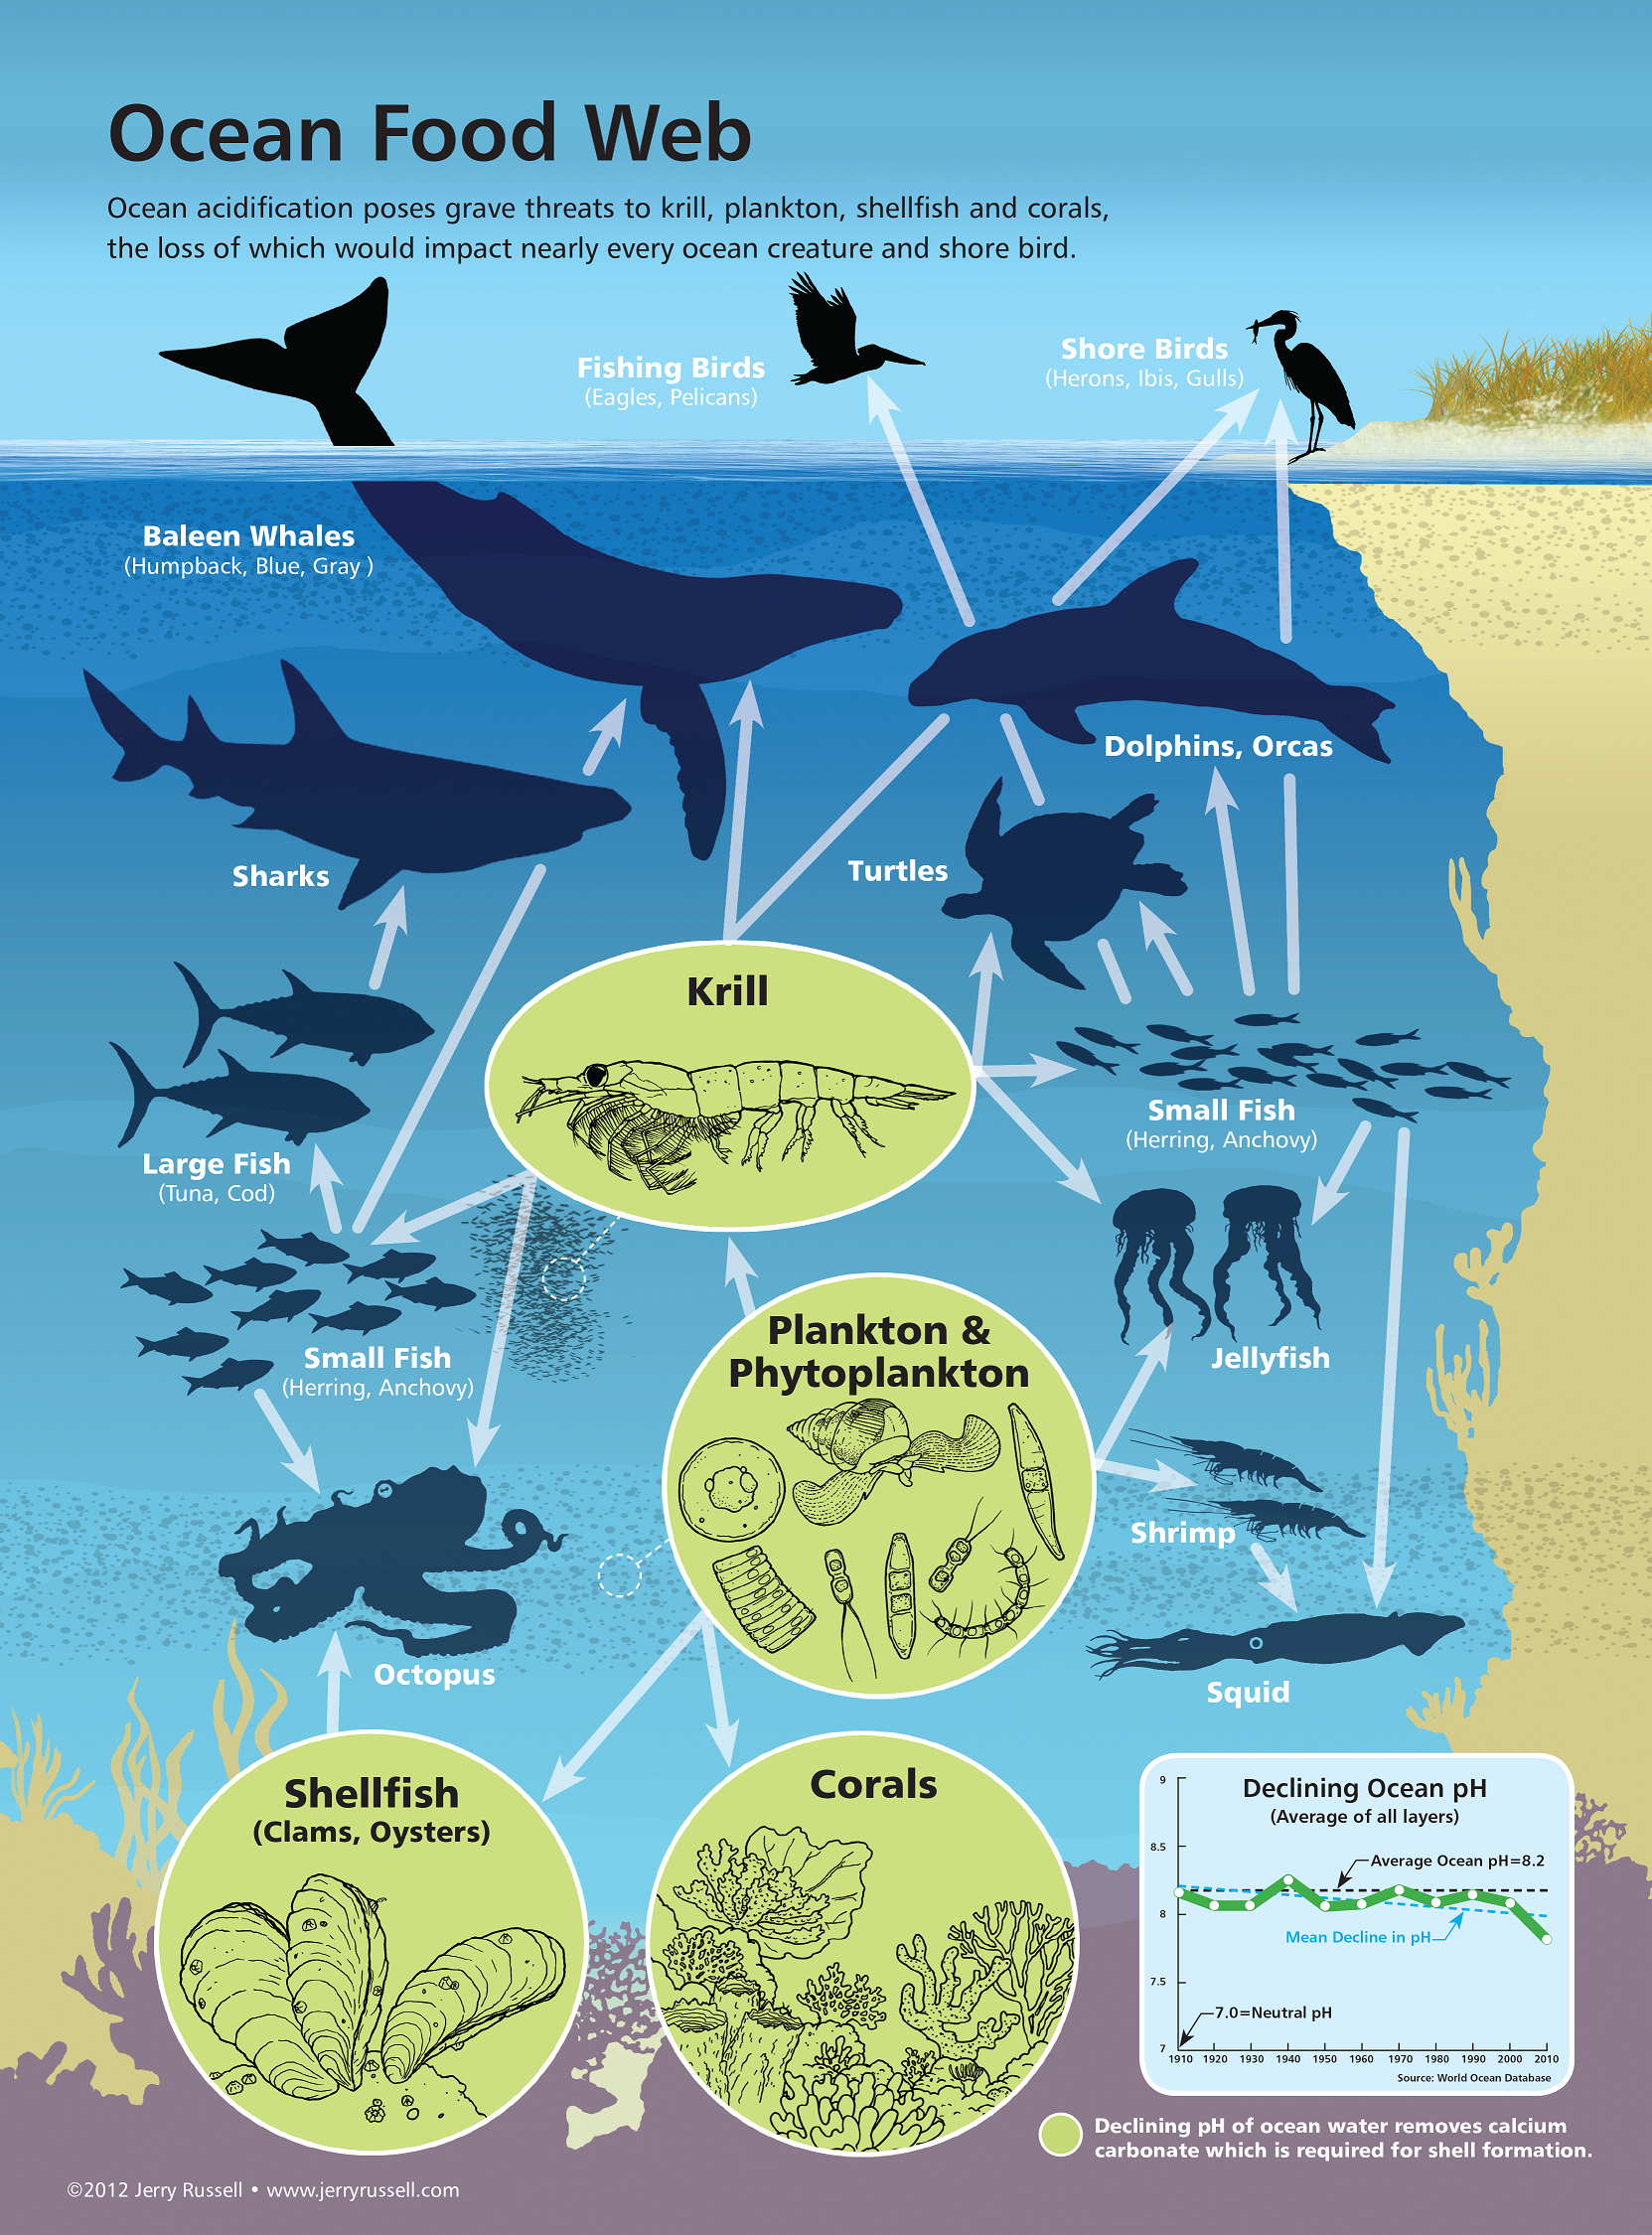 Impact Of Ocean Acidification On Marine Food Webs